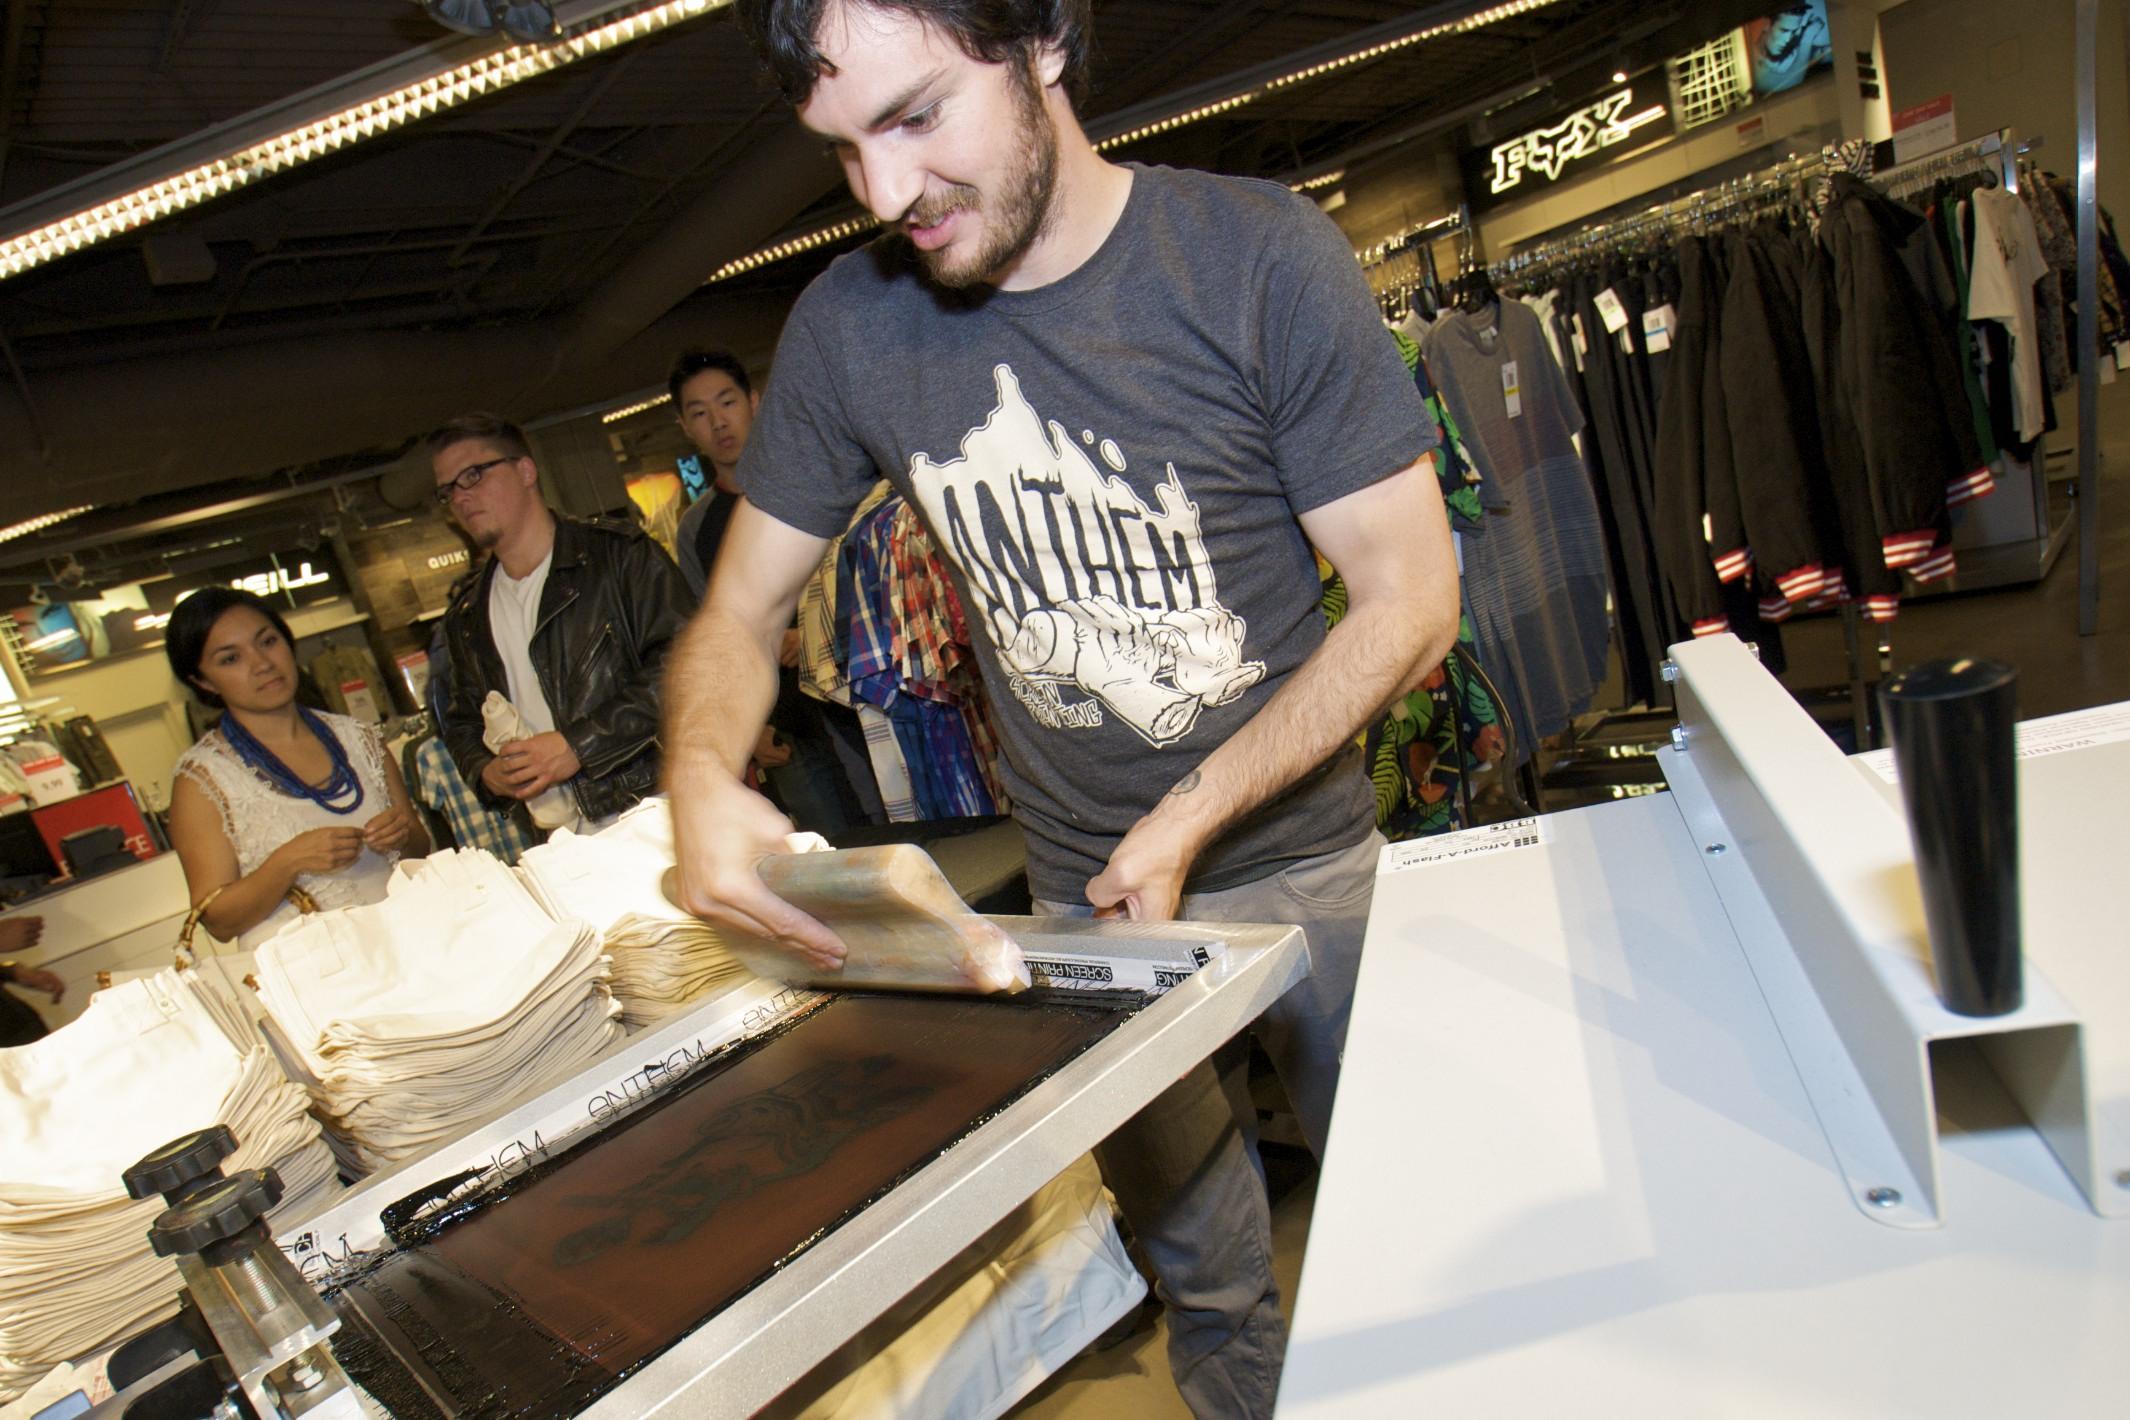 Making Screen Printing T-Shirts!